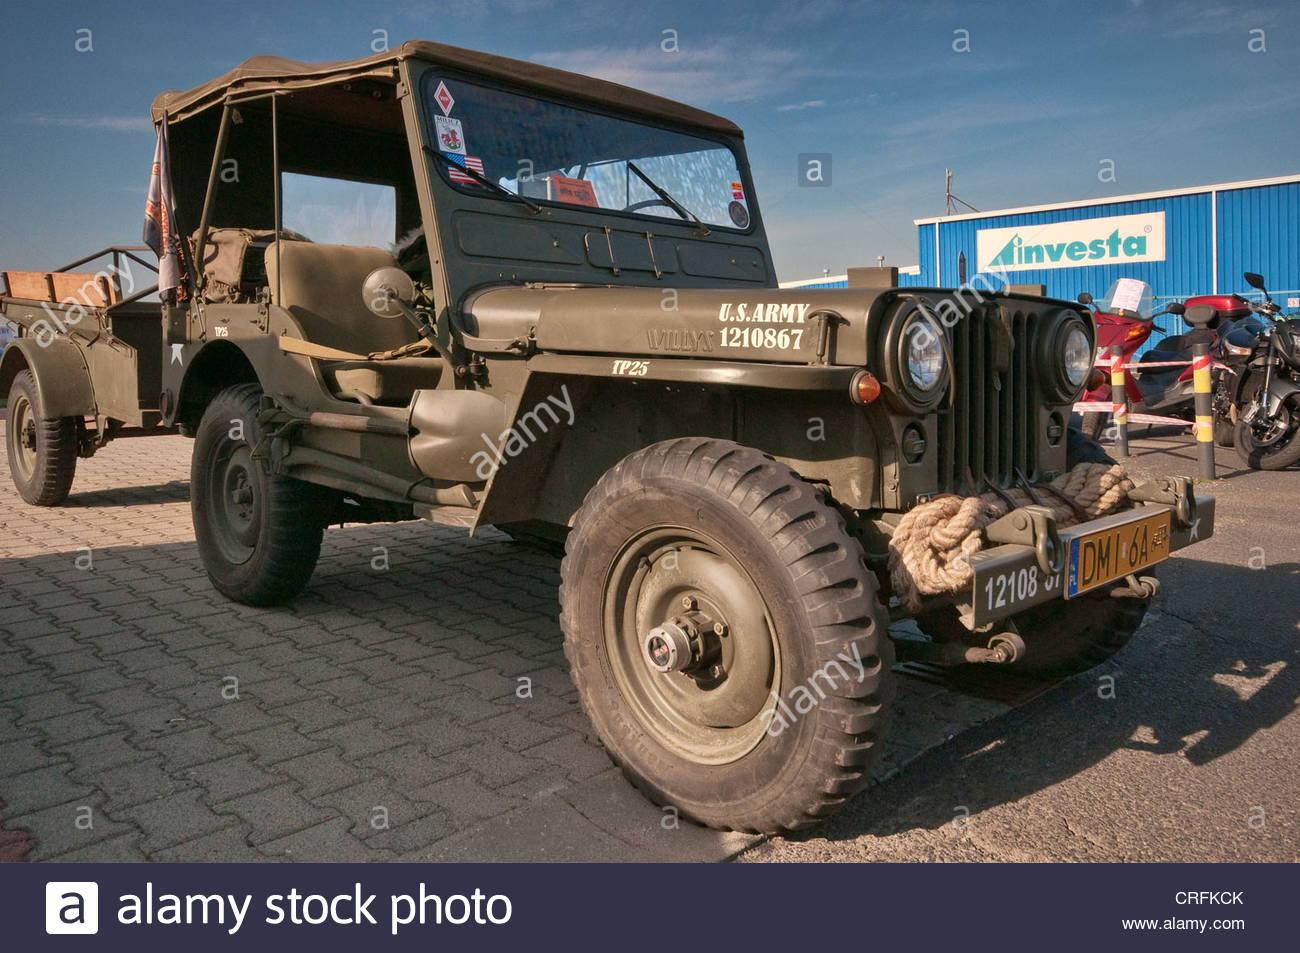 WW2 Willys MB jeep, Oldtimer Bazar fair in Wroclaw, Lower Silesia, Poland - Stock Image